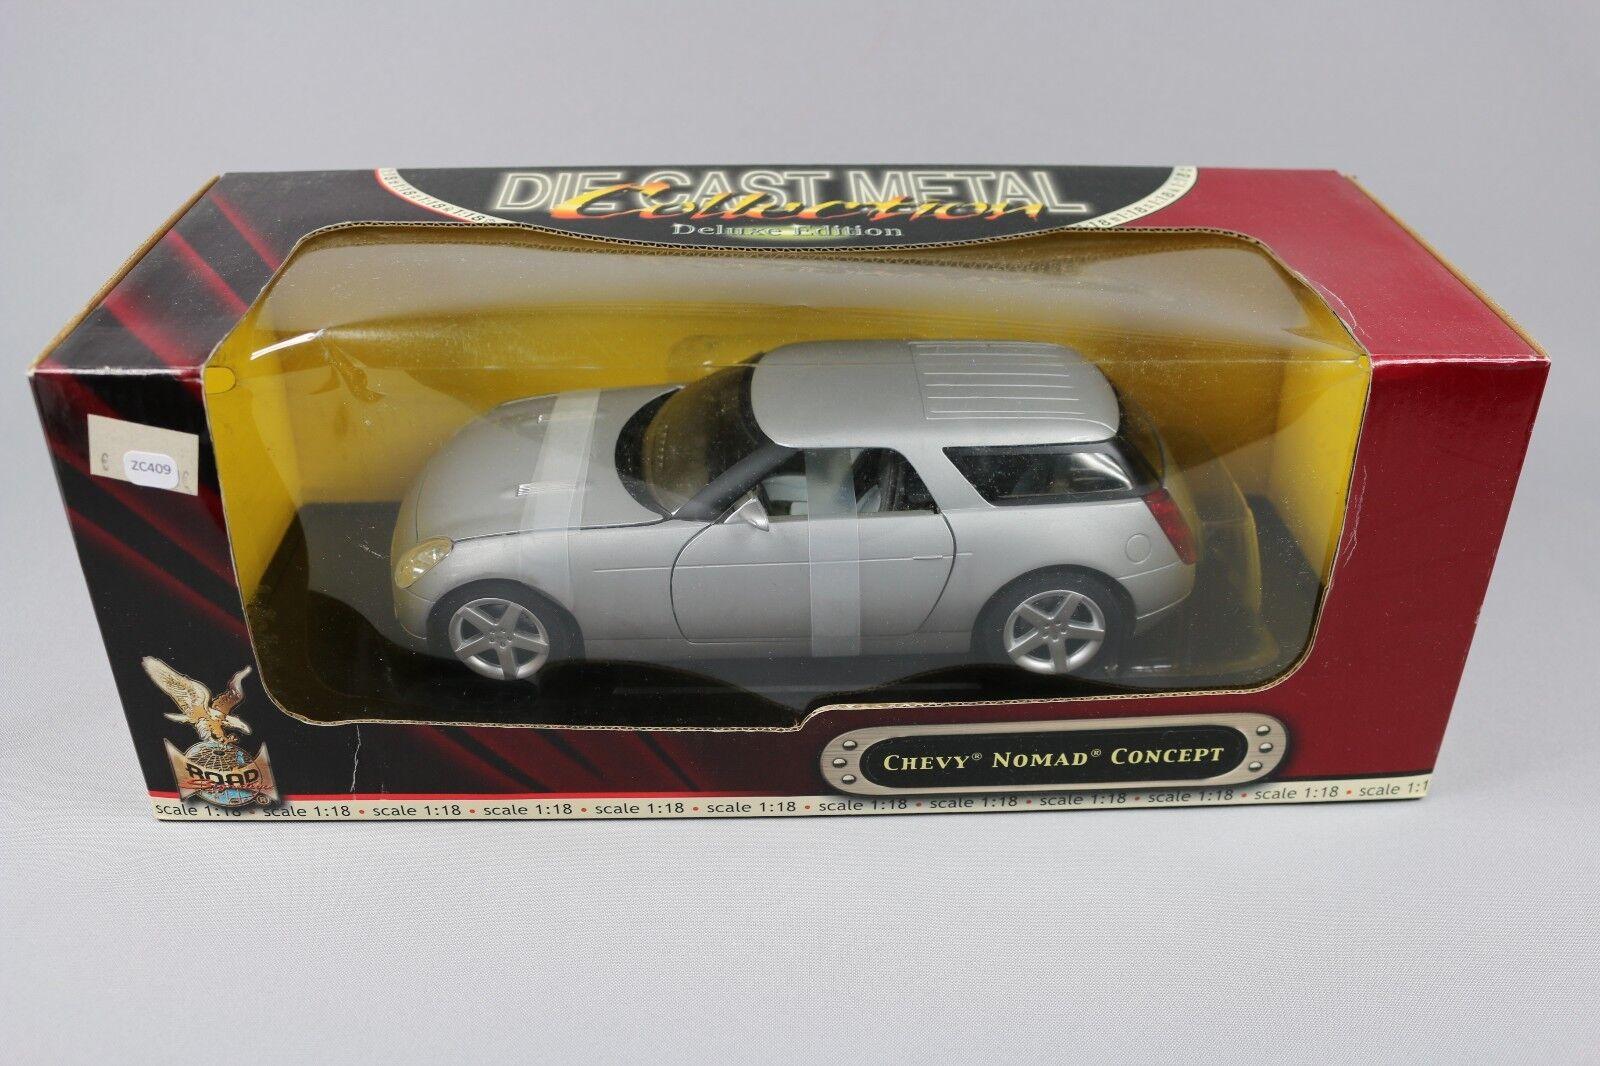 ZC409 Road Signature 92668 Voiture Miniature Miniature Miniature Deluxe 1 18 Chevy Nomad Concept ac82fb